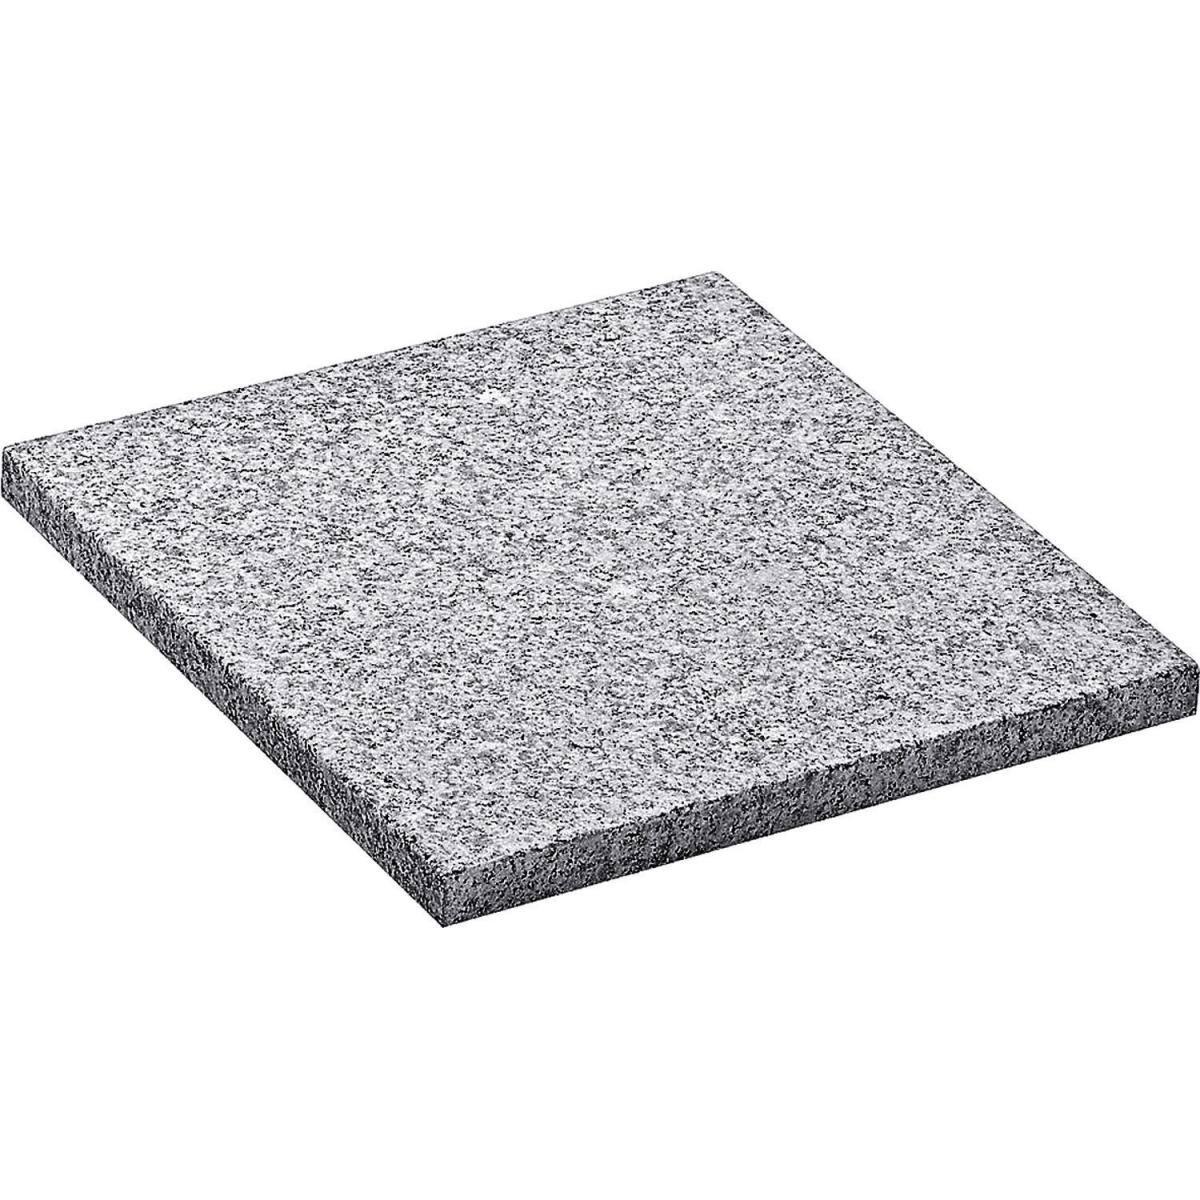 "Wingart Terrassenplatte ""Granit"", granit-grau"